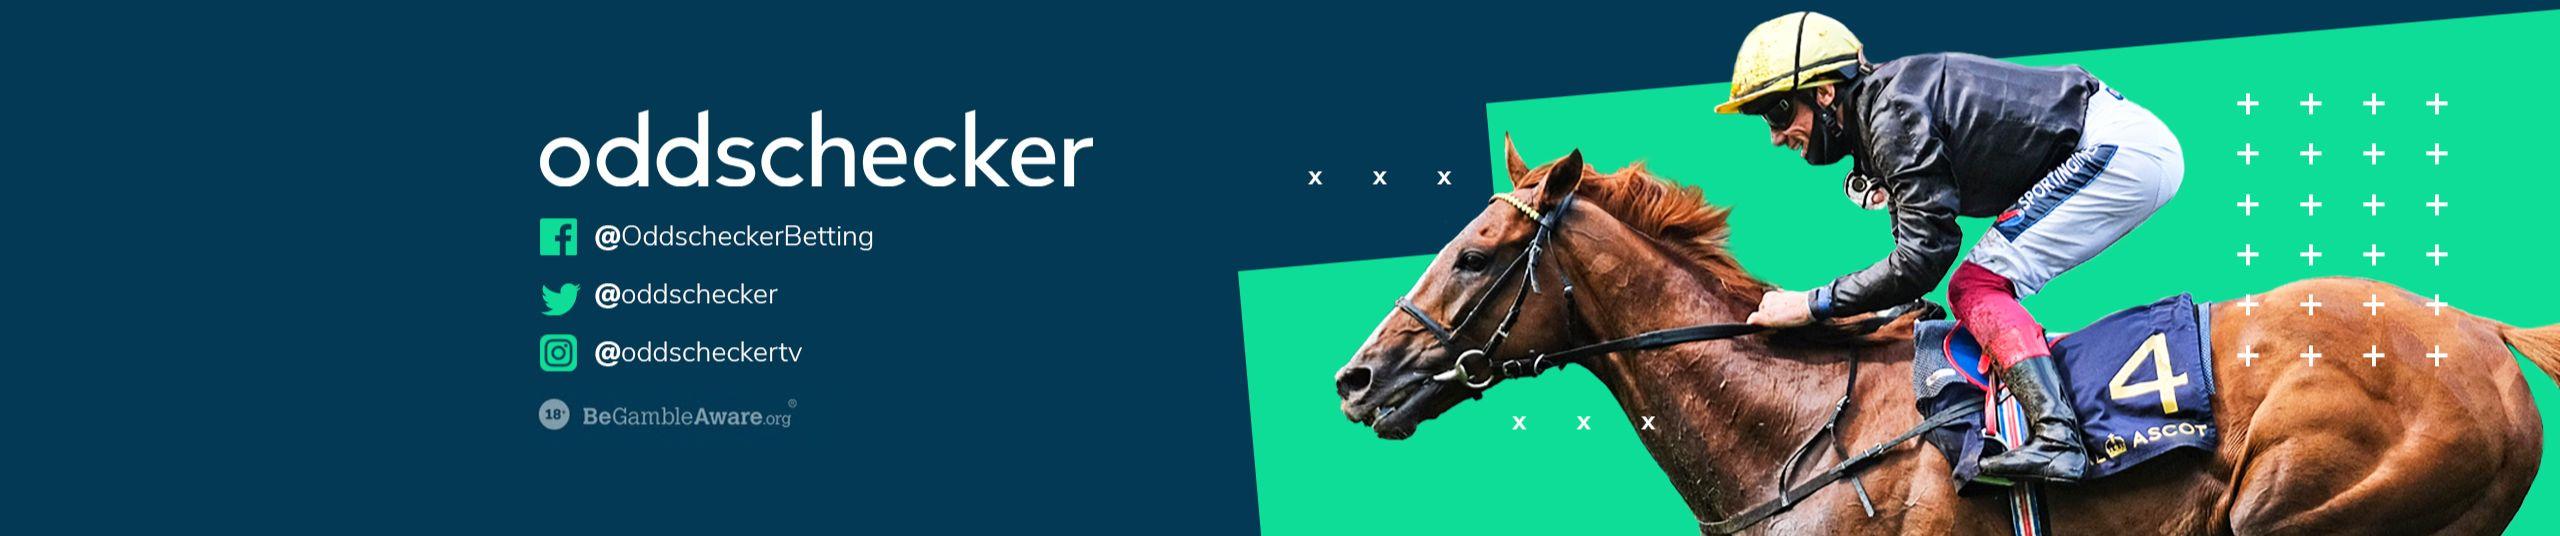 Oddschecker horse racing betting ascot portland vs memphis betting experts